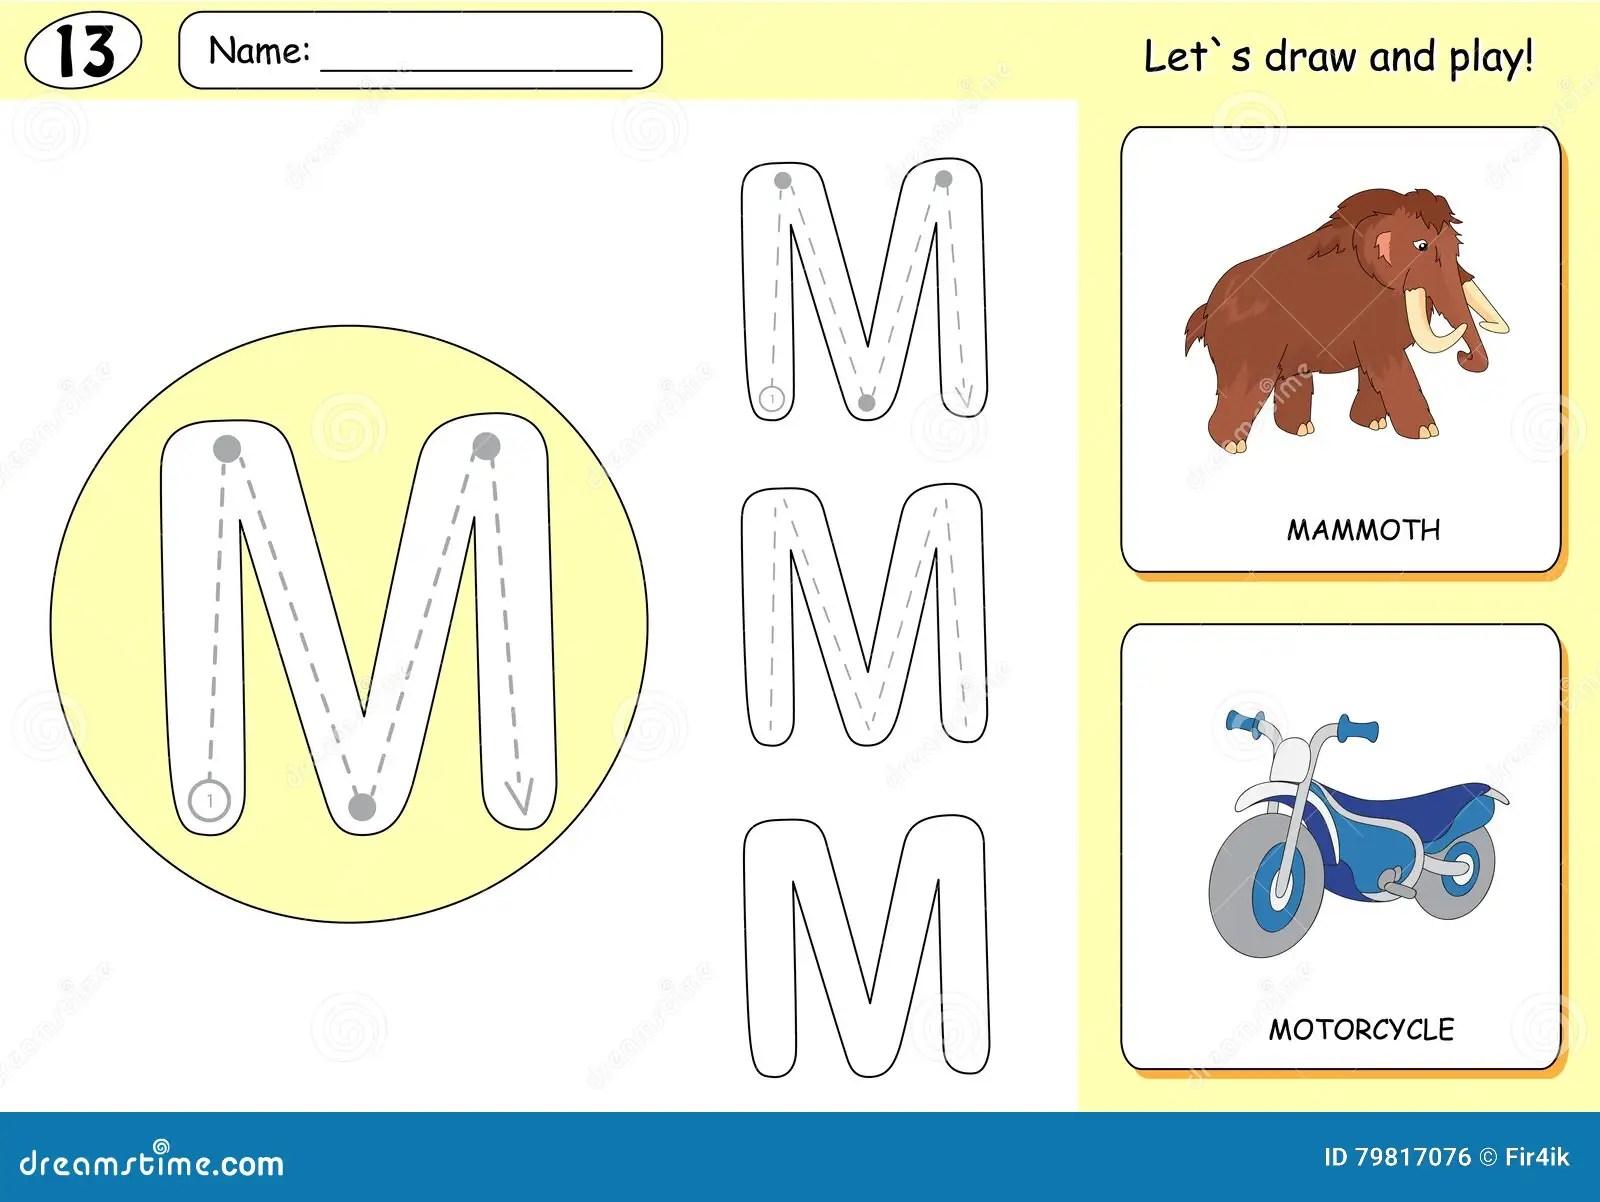 Cartoon Mammoth And Motorcycle Alphabet Tracing Worksheet